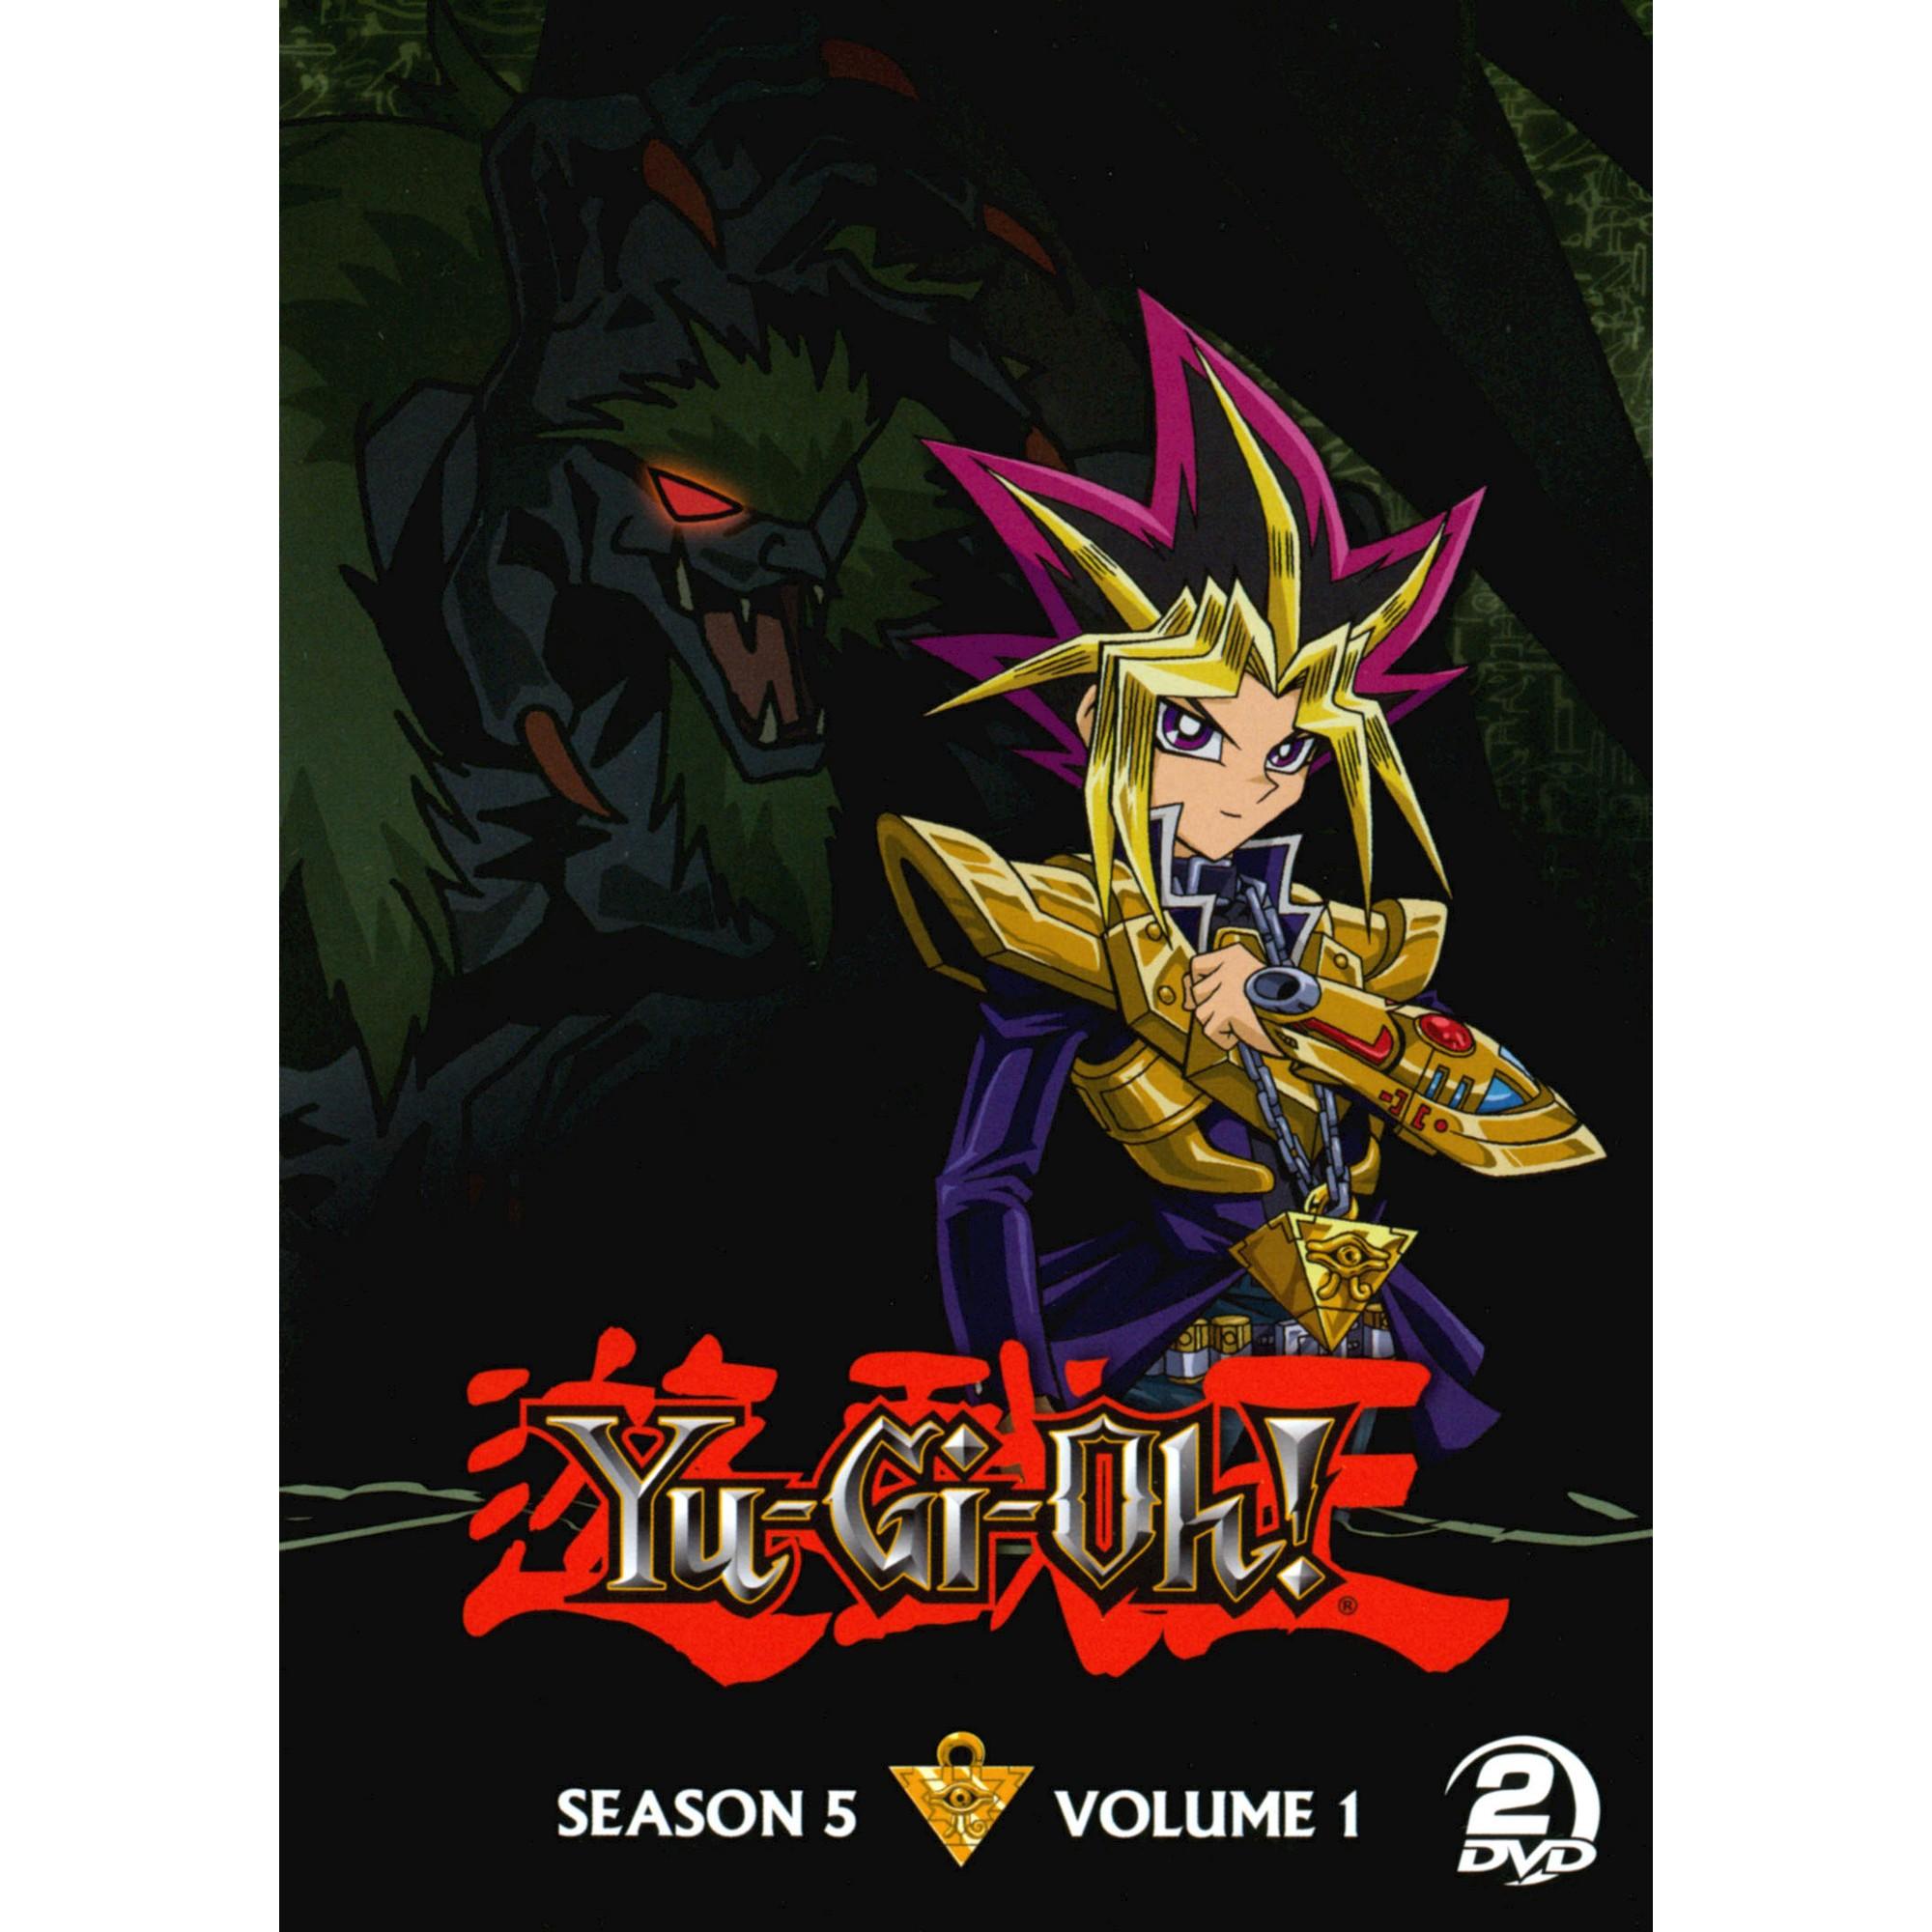 Yu gi oh classicSeason 5 vol 1 (Dvd) Yugioh, Yugioh